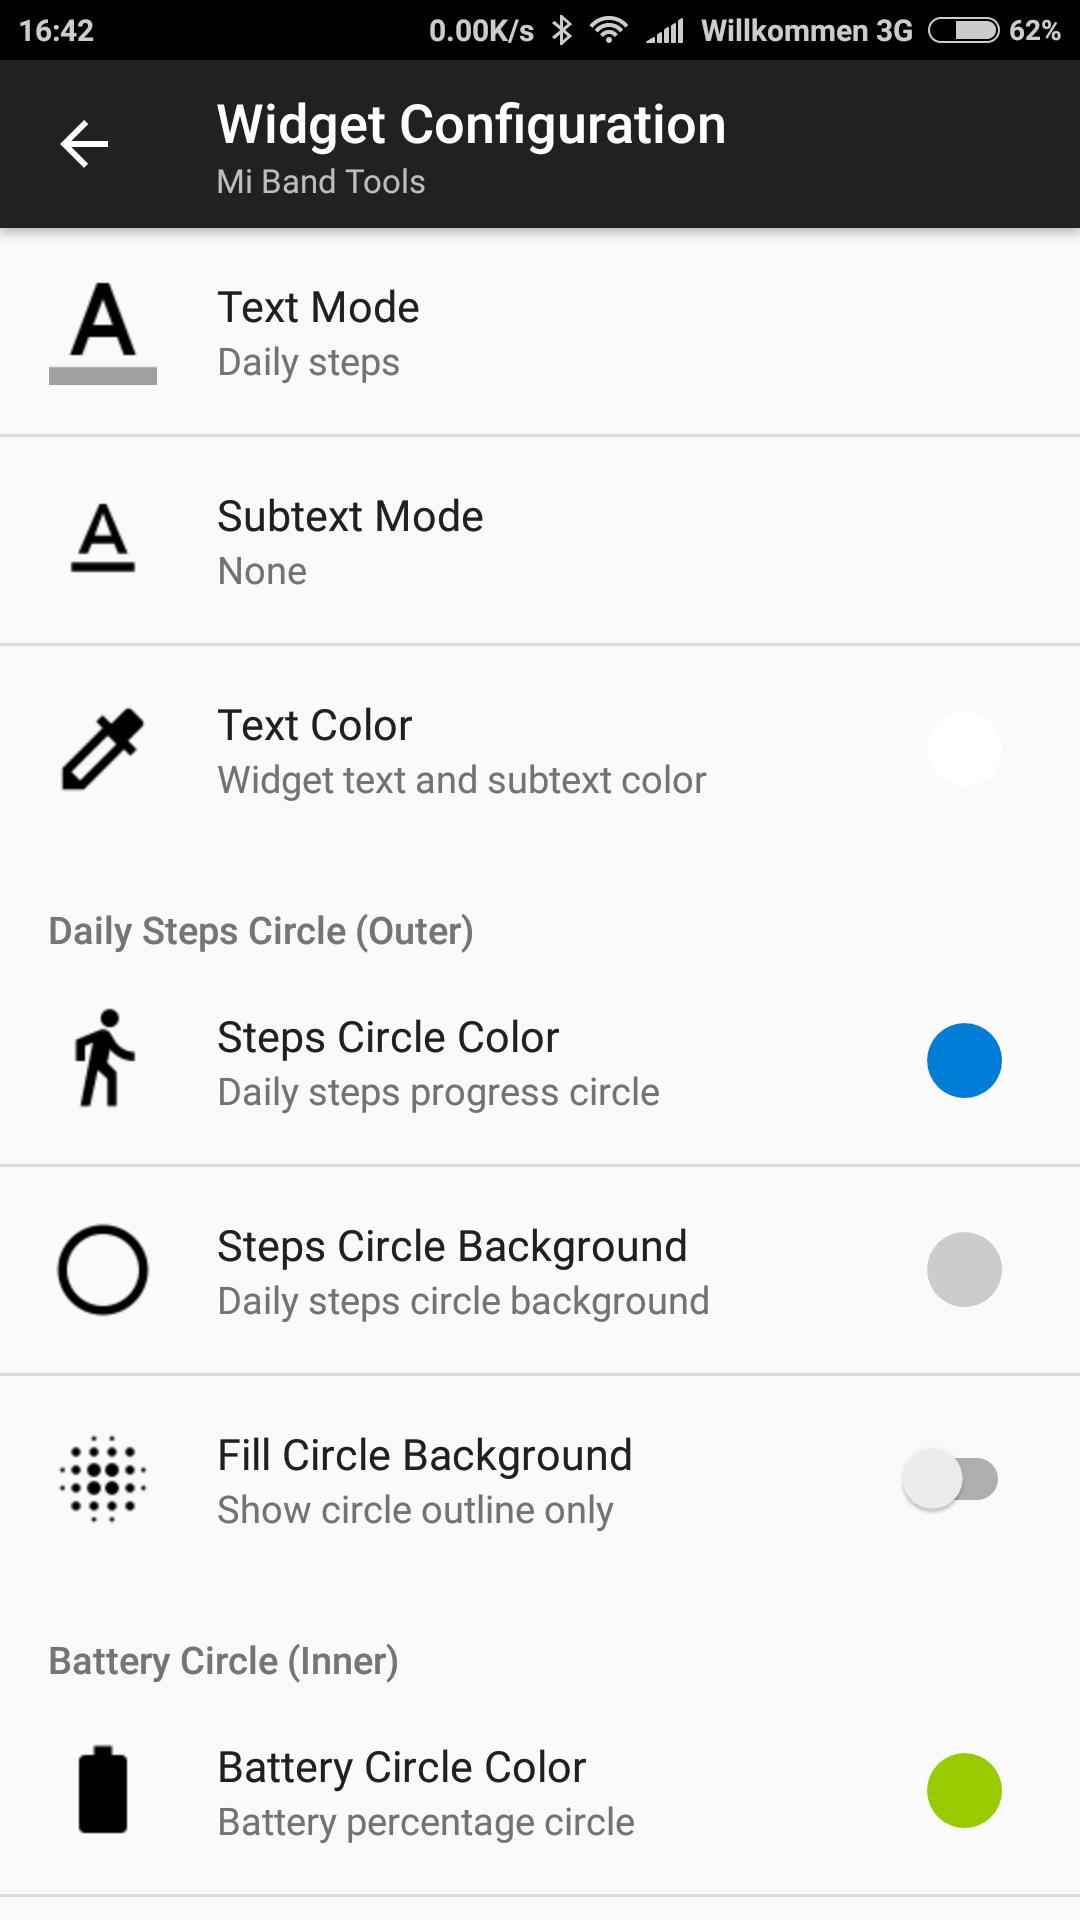 Mi Band 2 Update MiBandTools 4